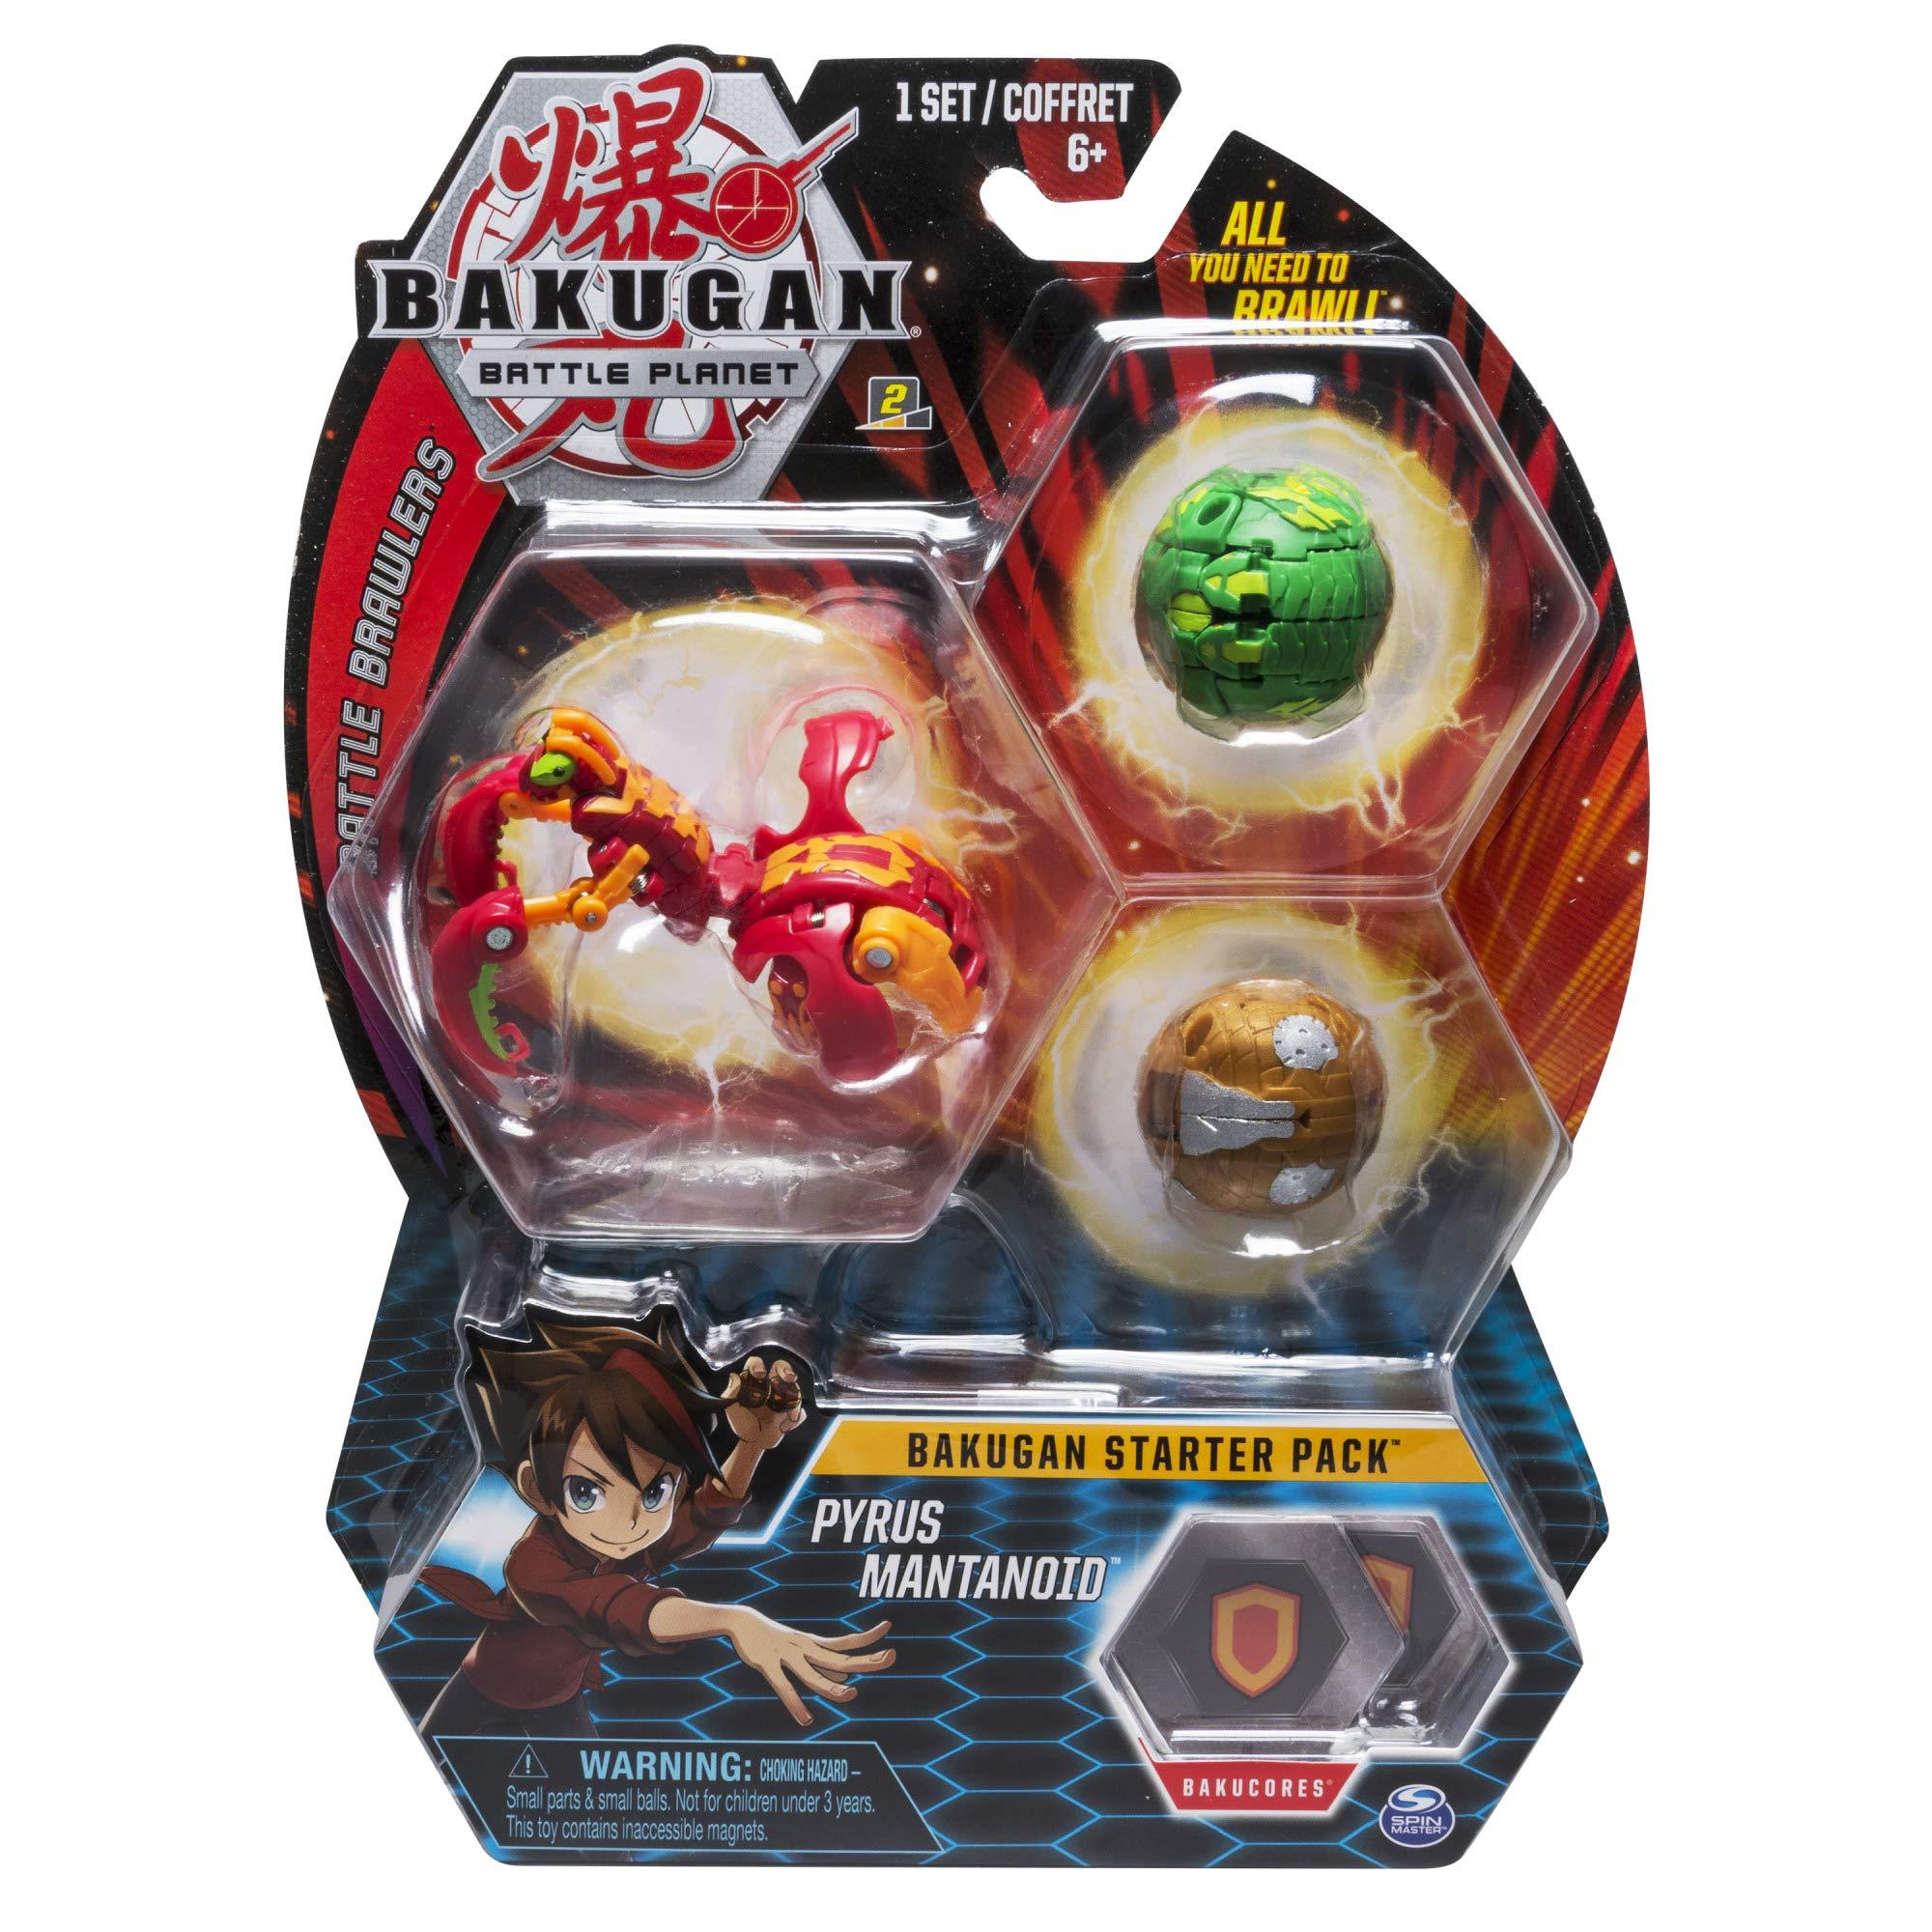 BAKUGAN Starter Pack Pyrus Mantanoid Multicolore (Bizak 61924426)